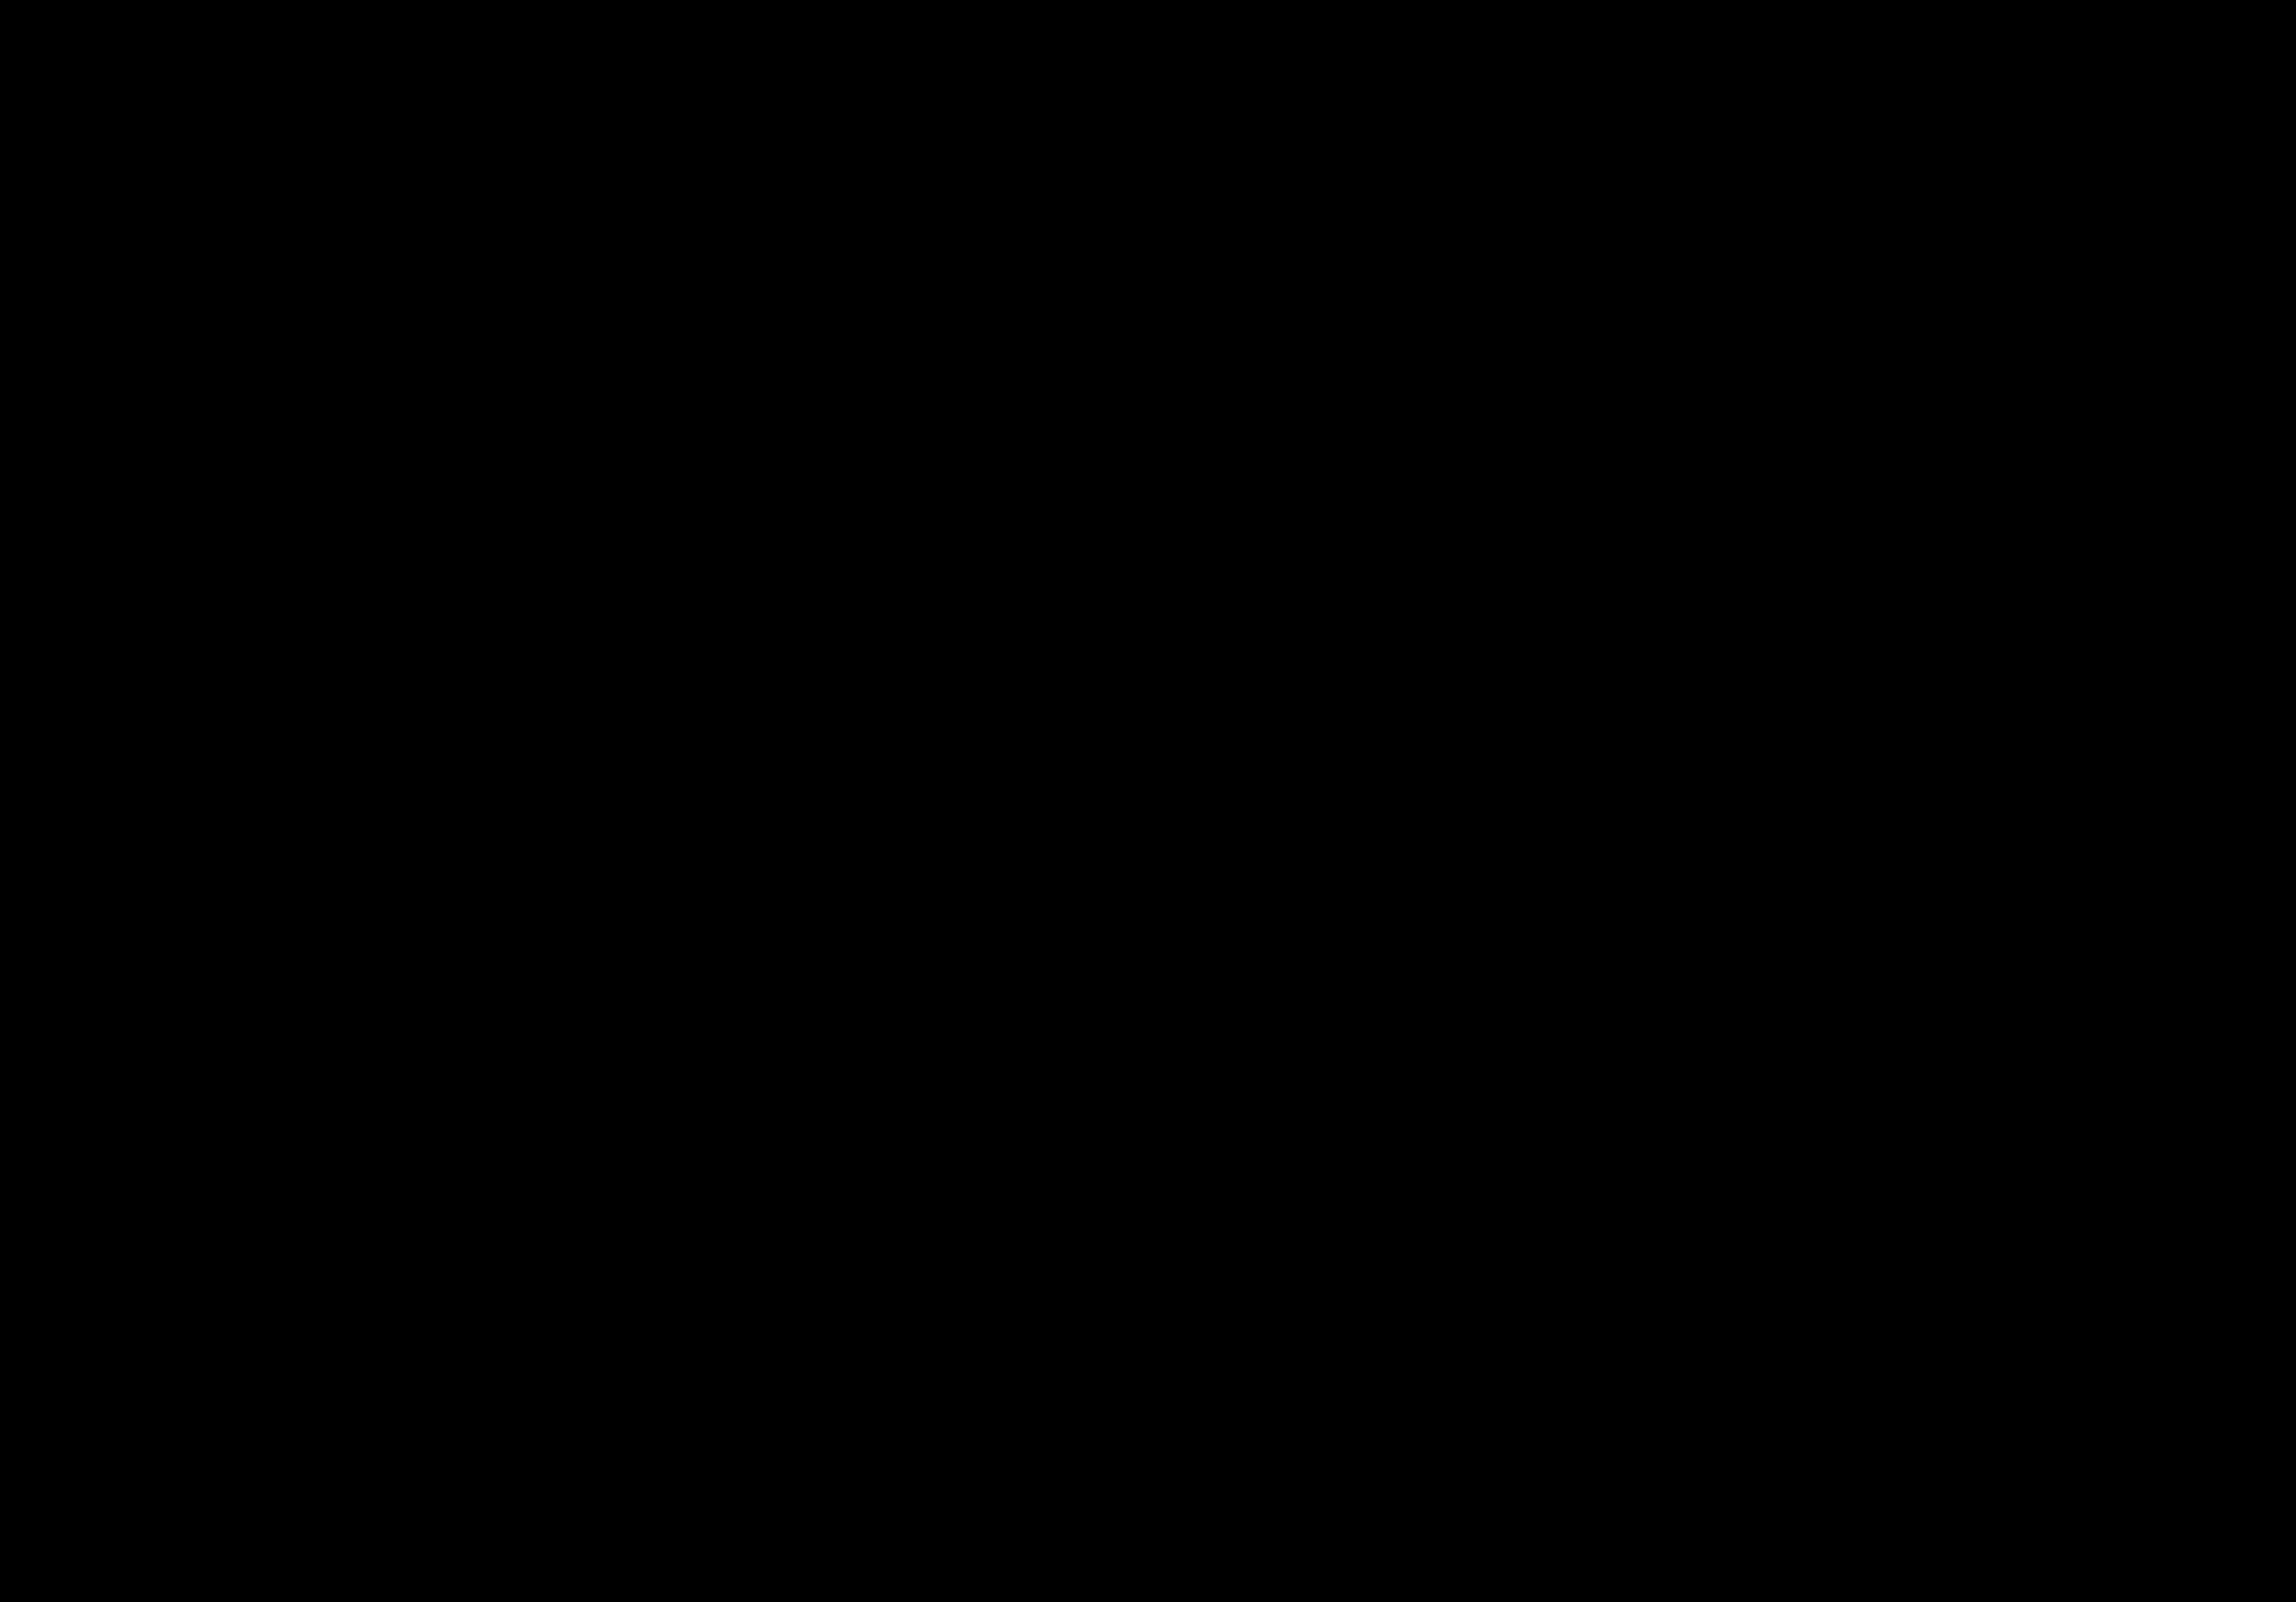 2400x1675 Clipart